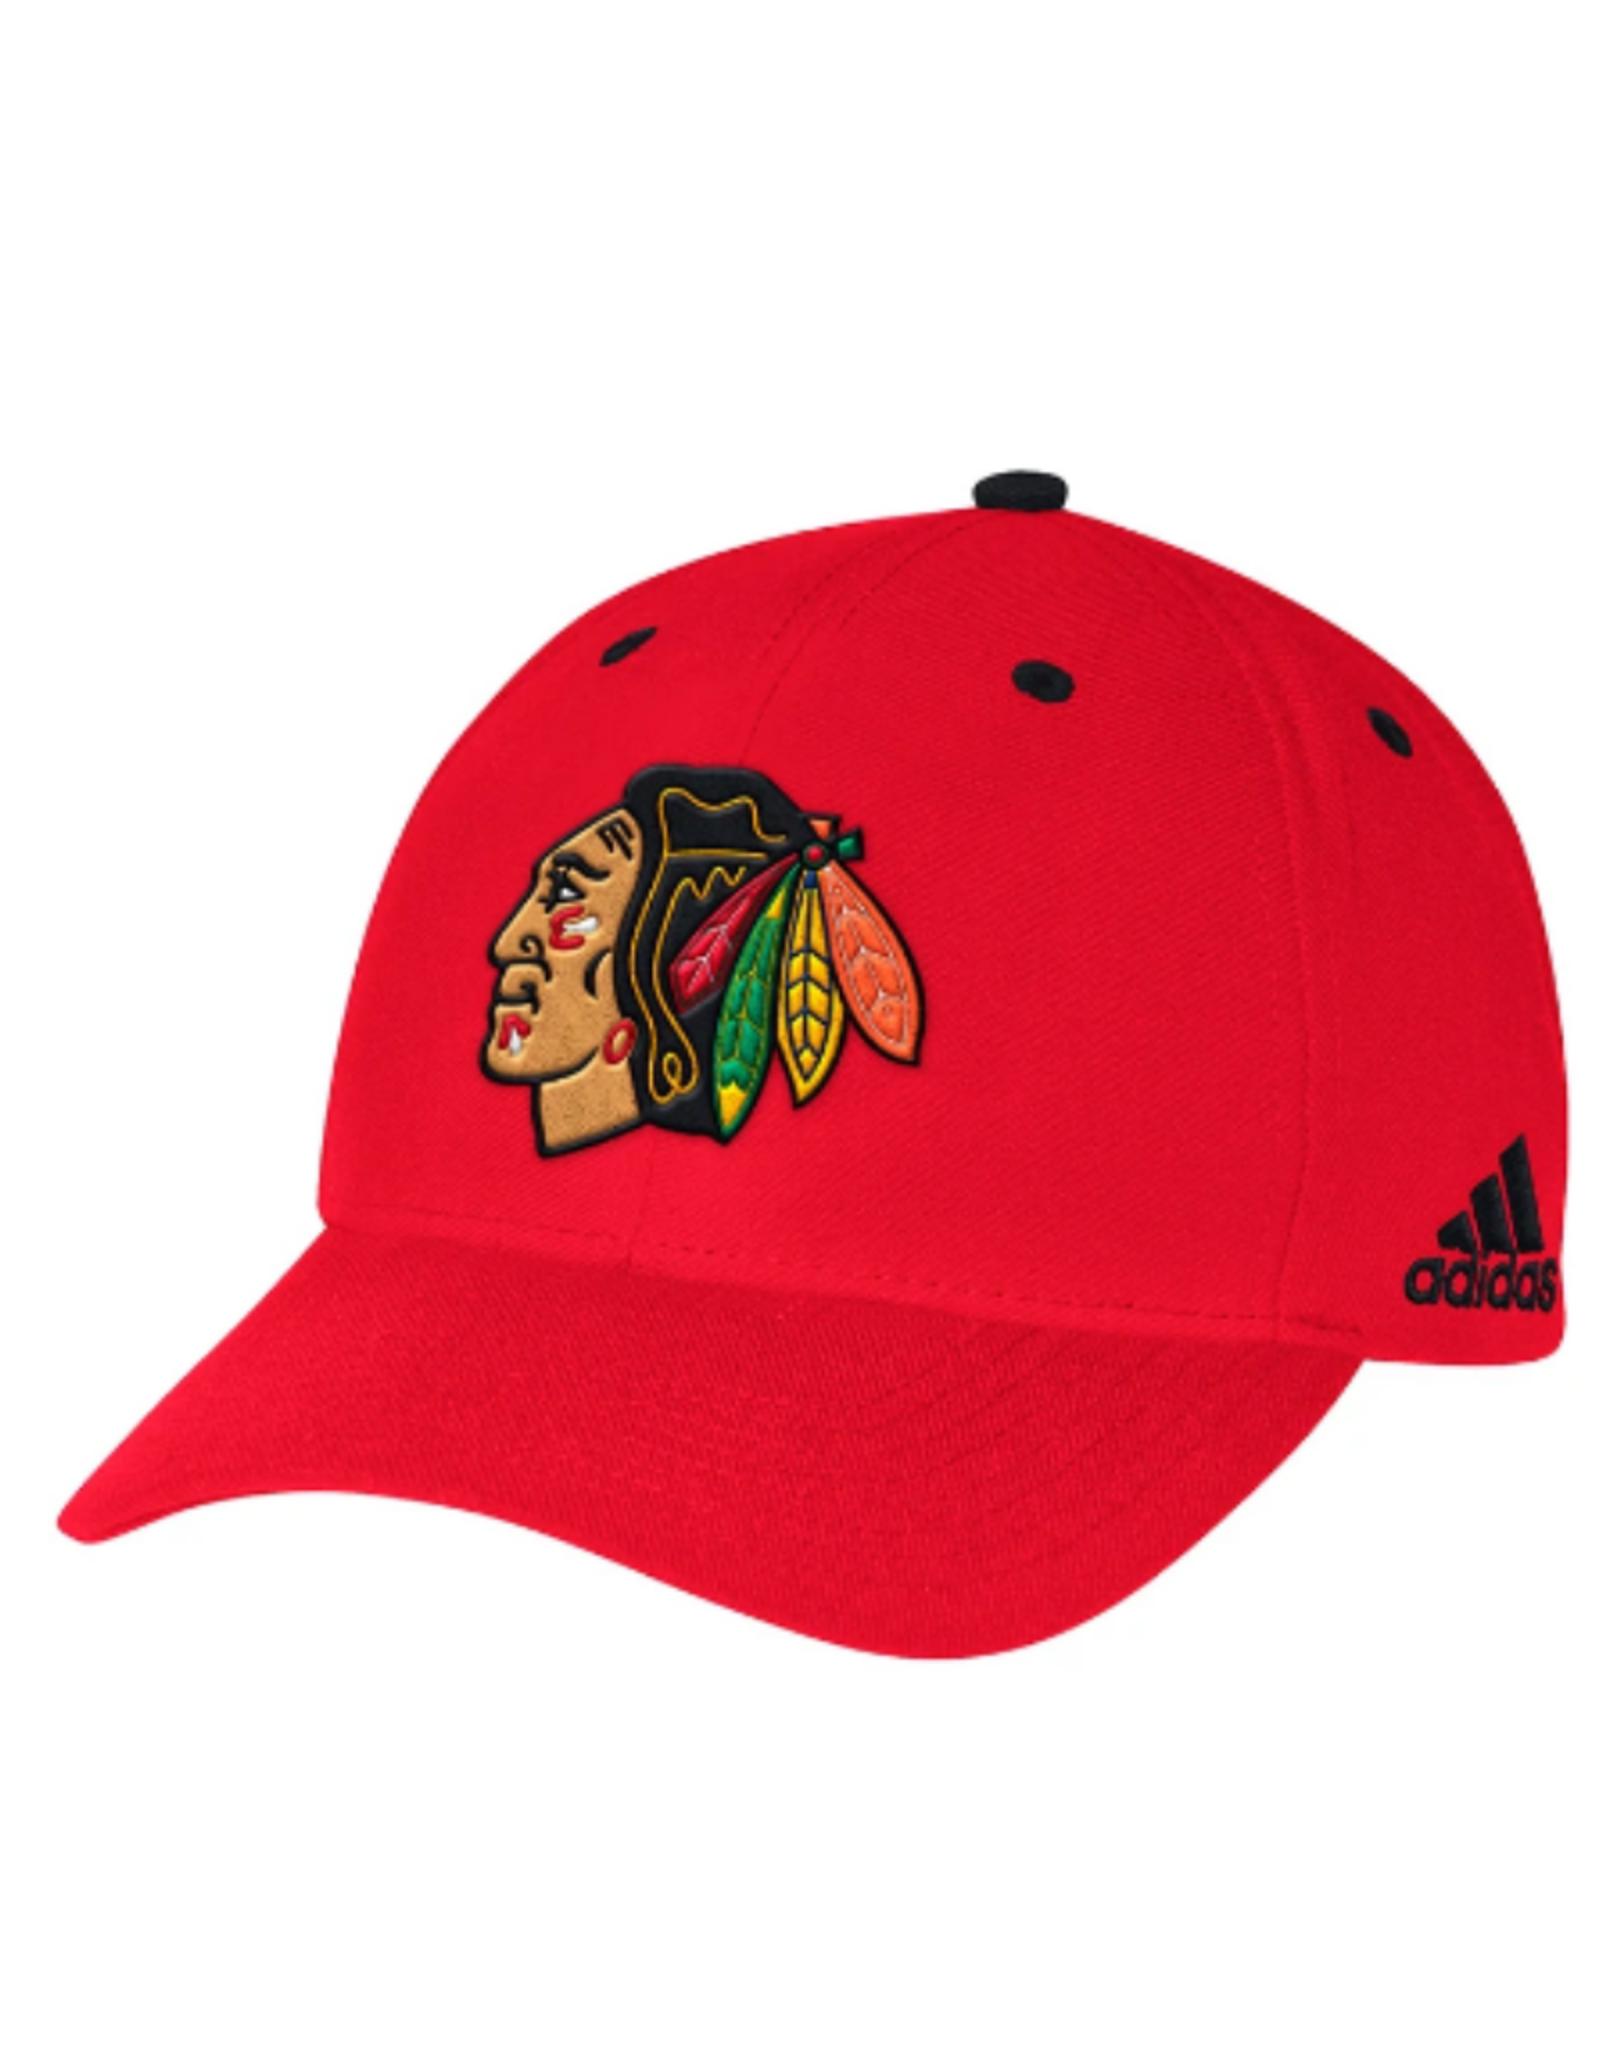 Adidas Adidas Men's Structured Snapback Hat Chicago Blackhawks Red